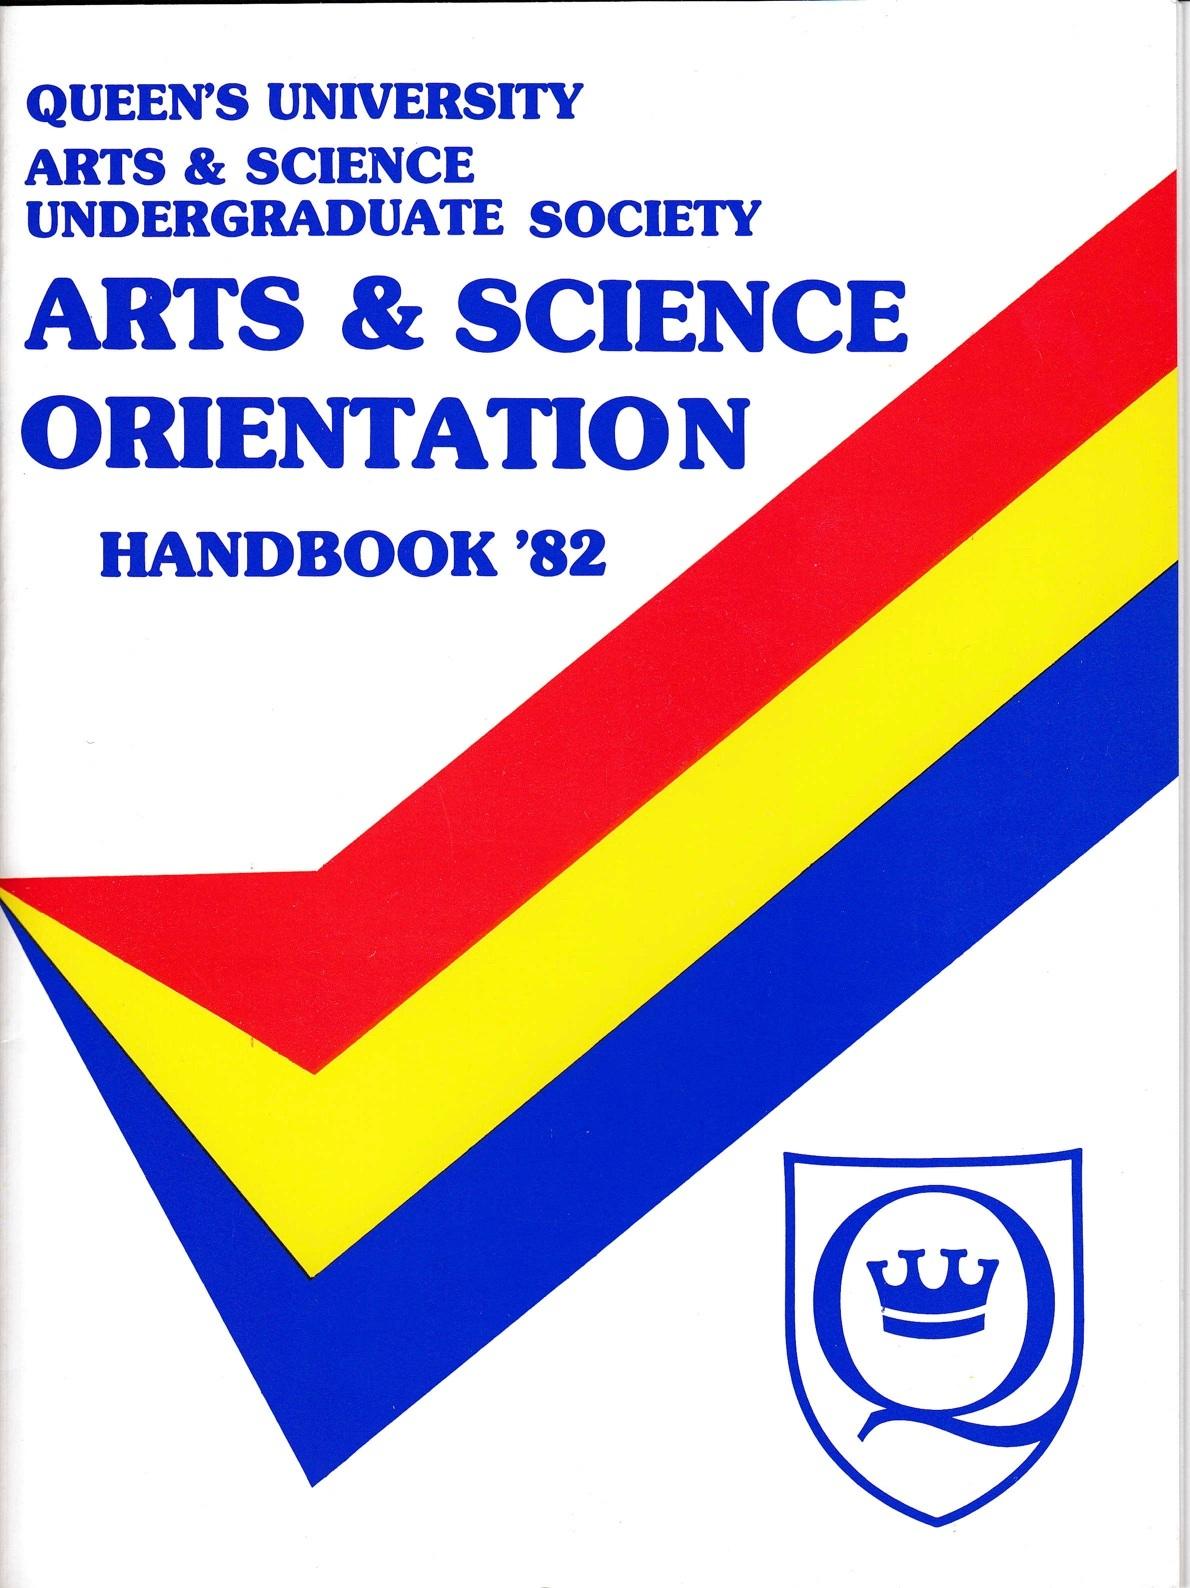 orientation handbook cover 1982.jpg